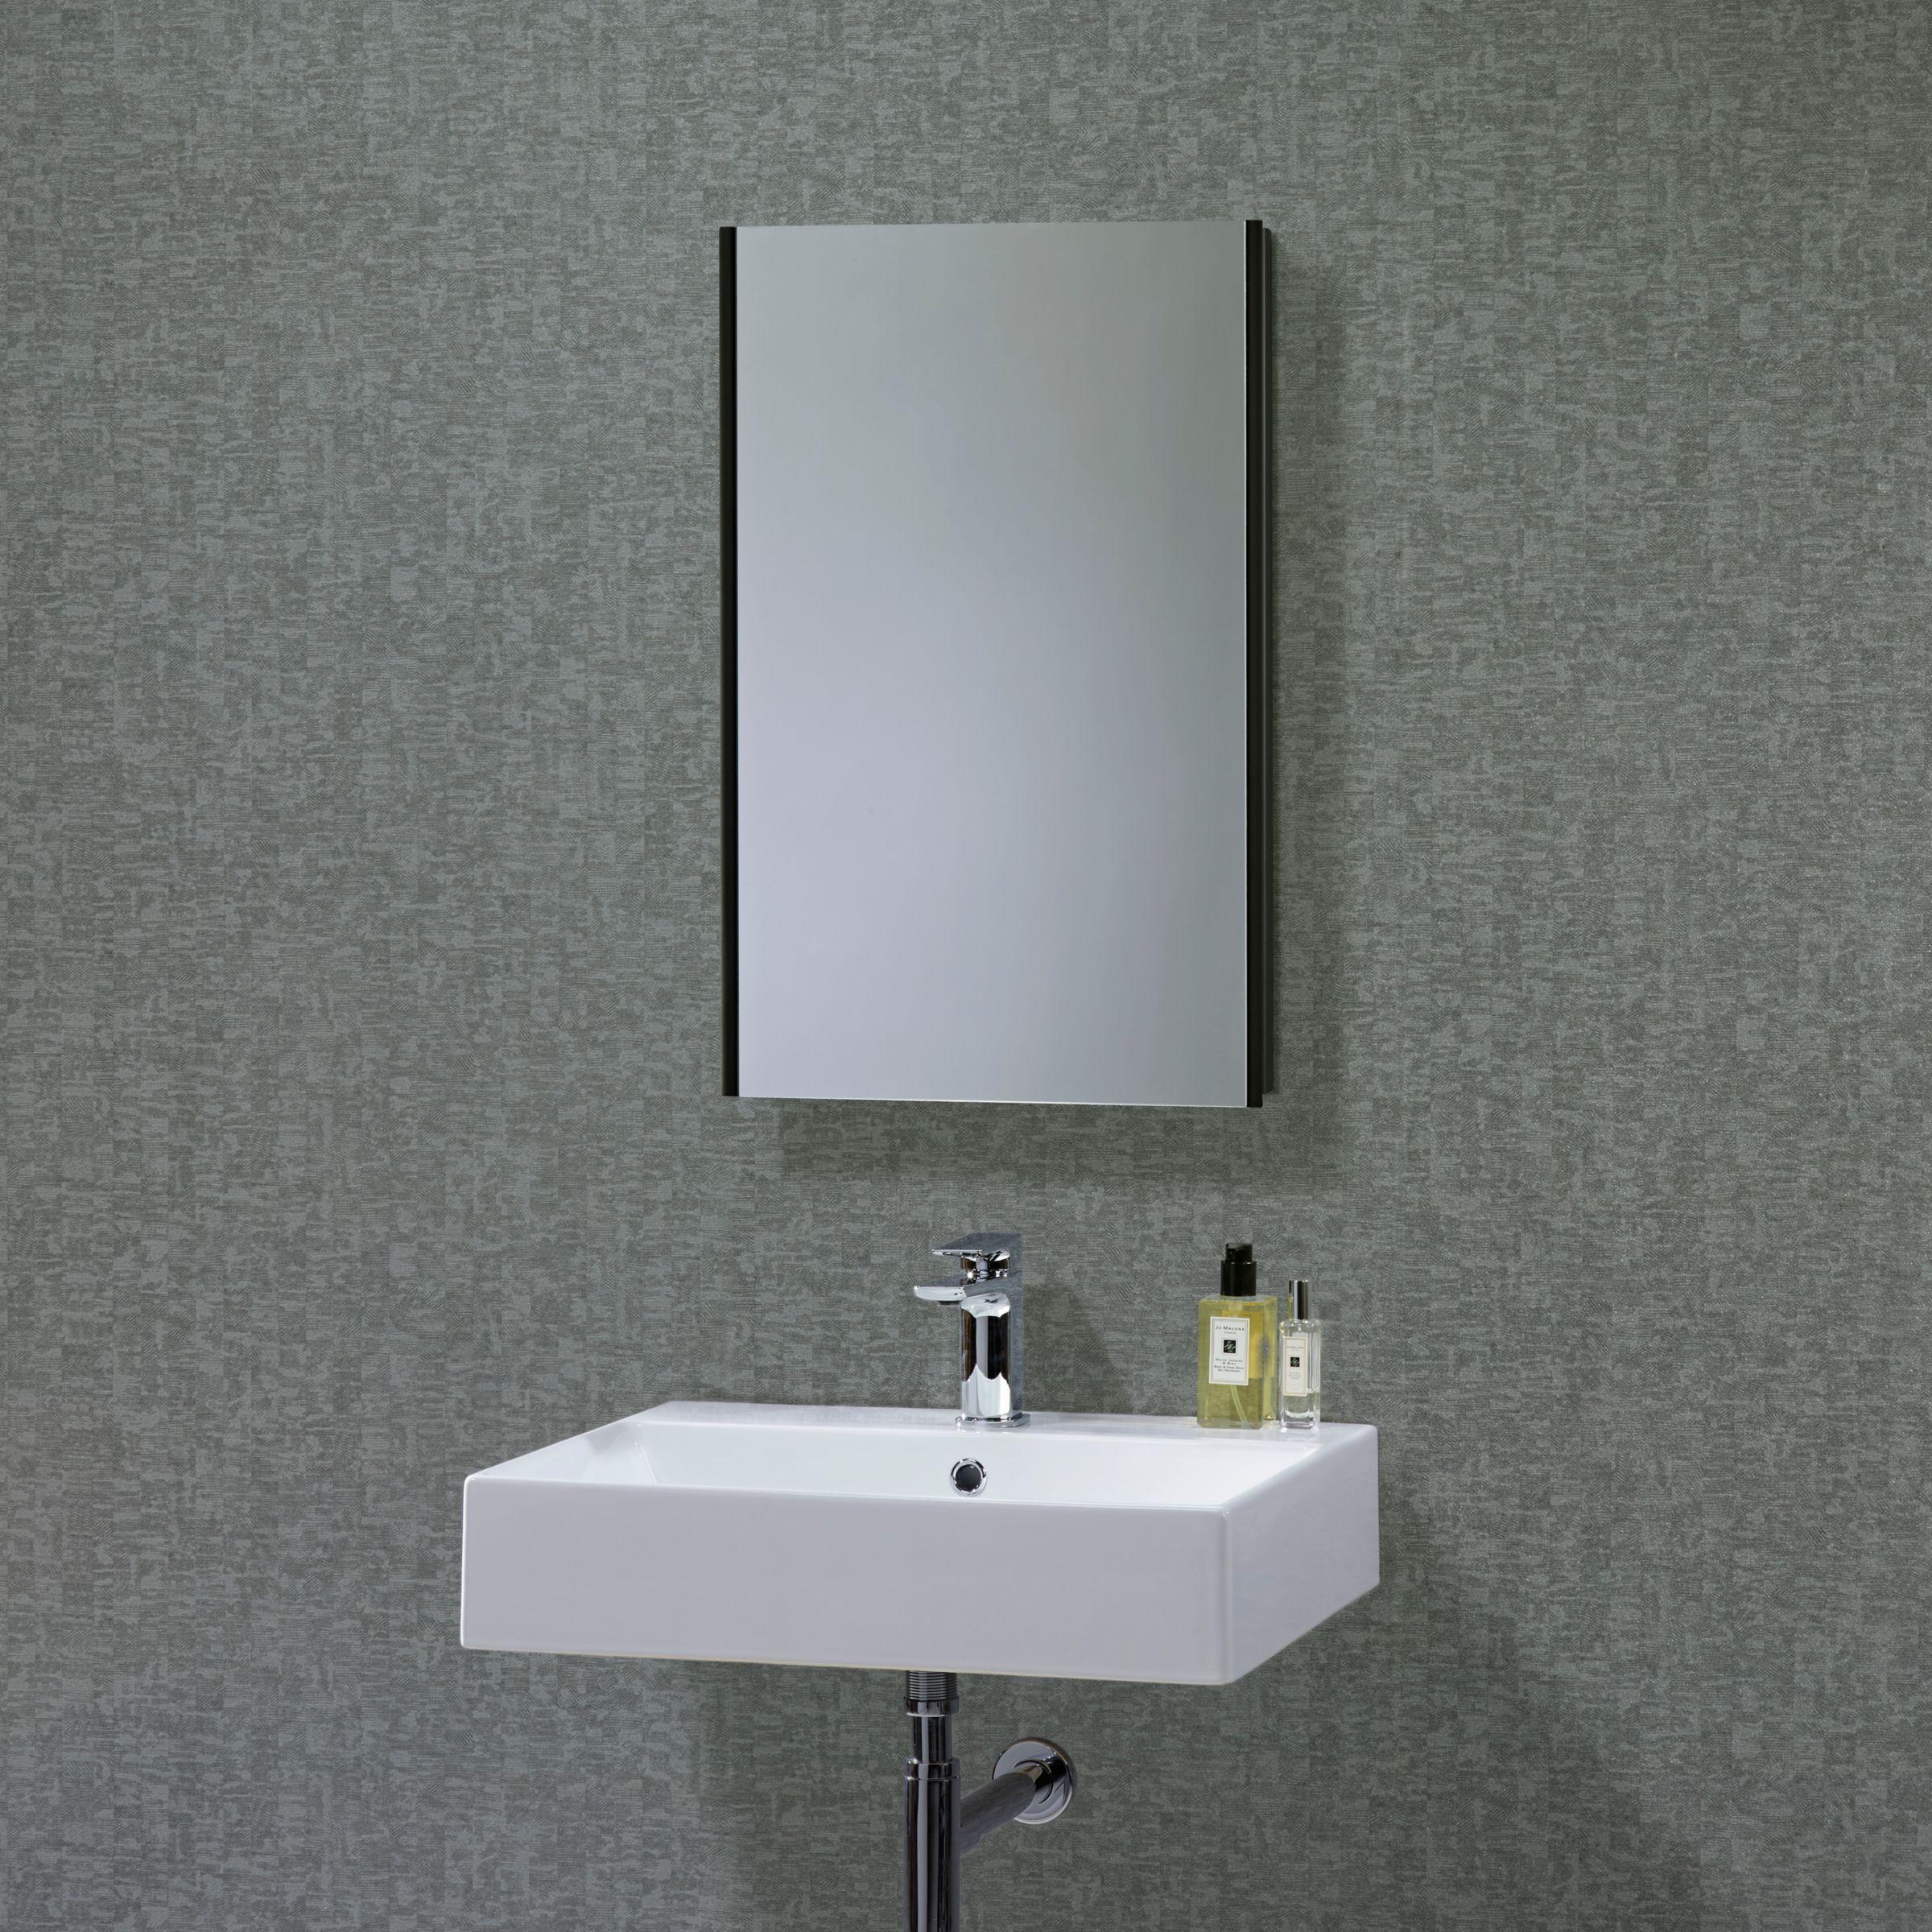 John Lewis Limit Slimline Single Door Bathroom Cabinet, Black at John Lewis